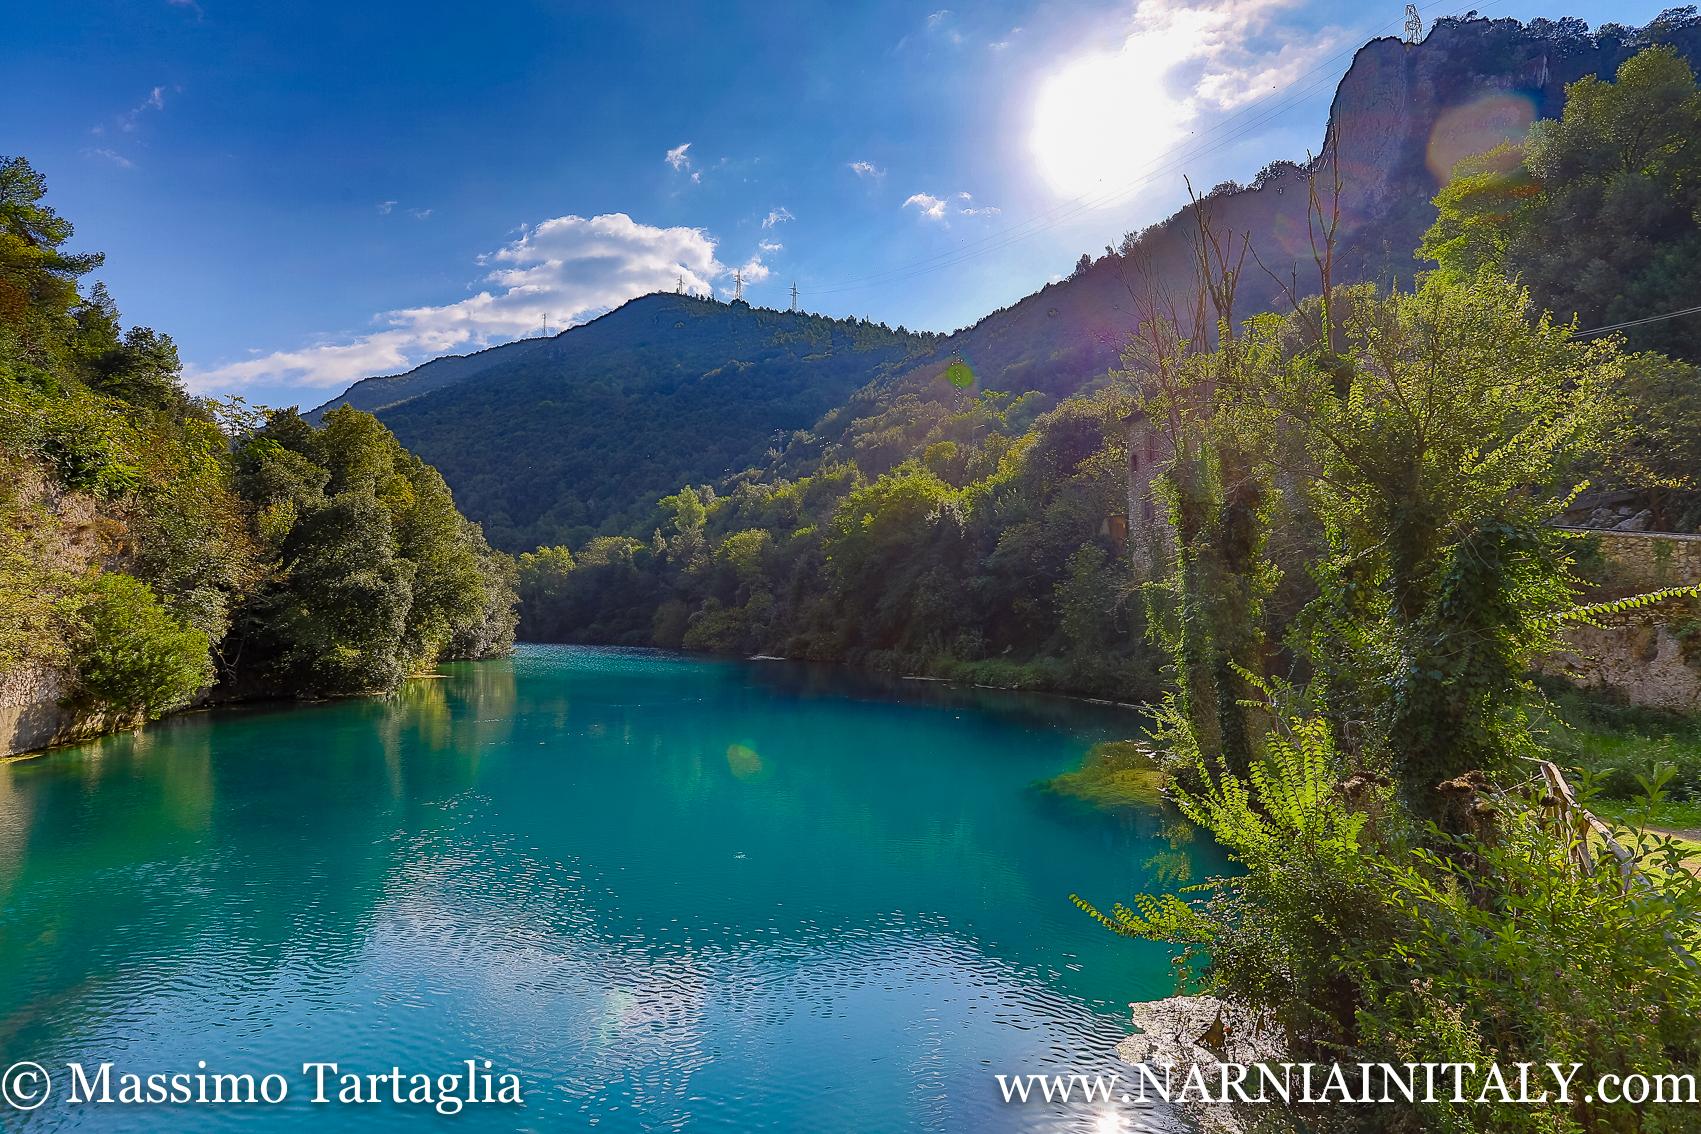 Stifone Narnia in Italy